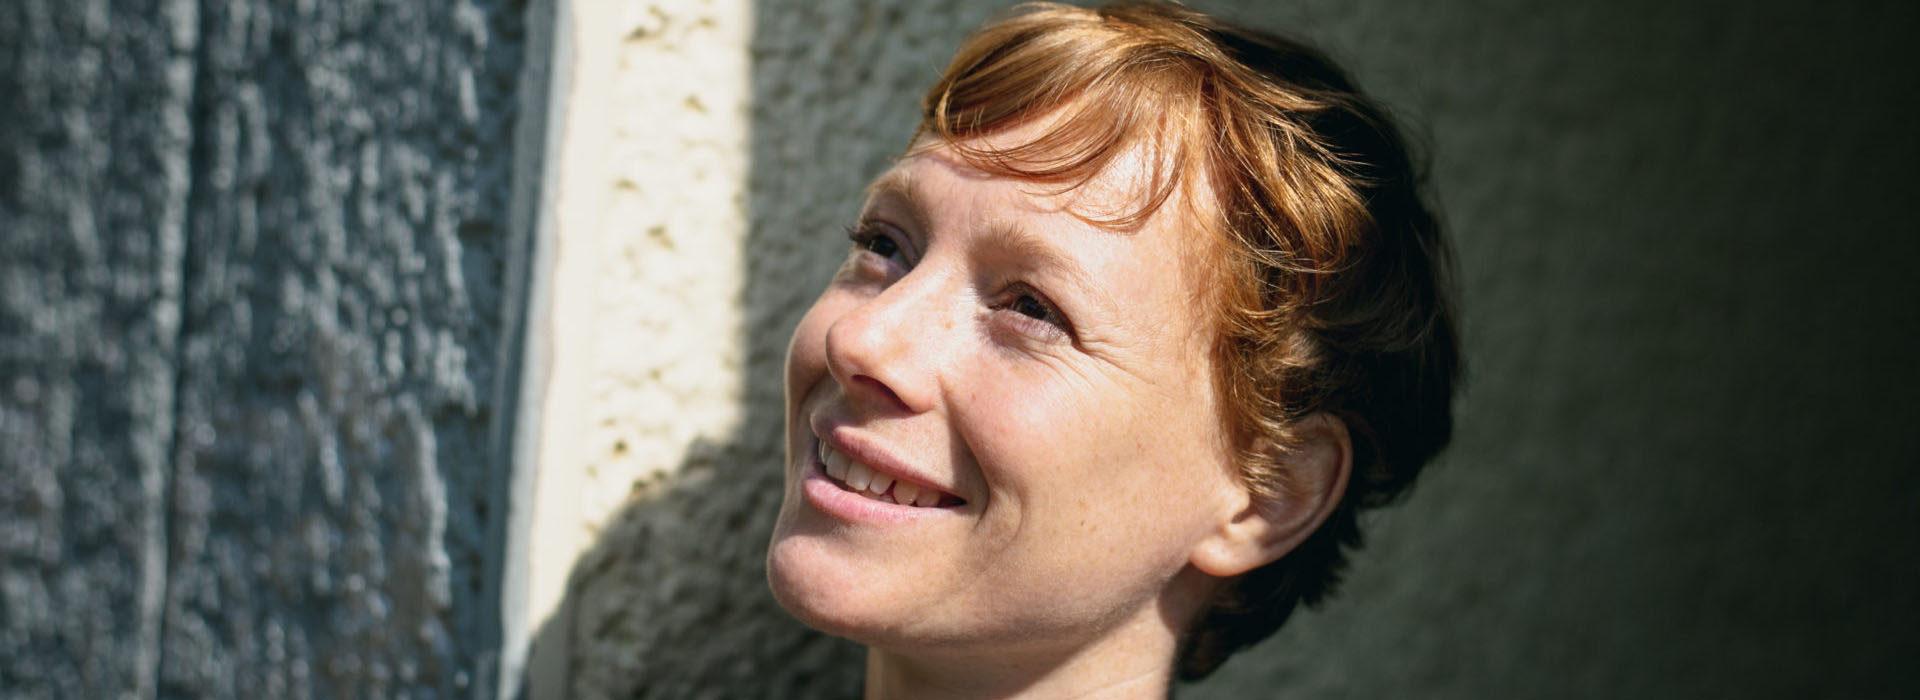 Caroline-Junghans_IMG_0678_Carolin-Weinkopf-1920x700